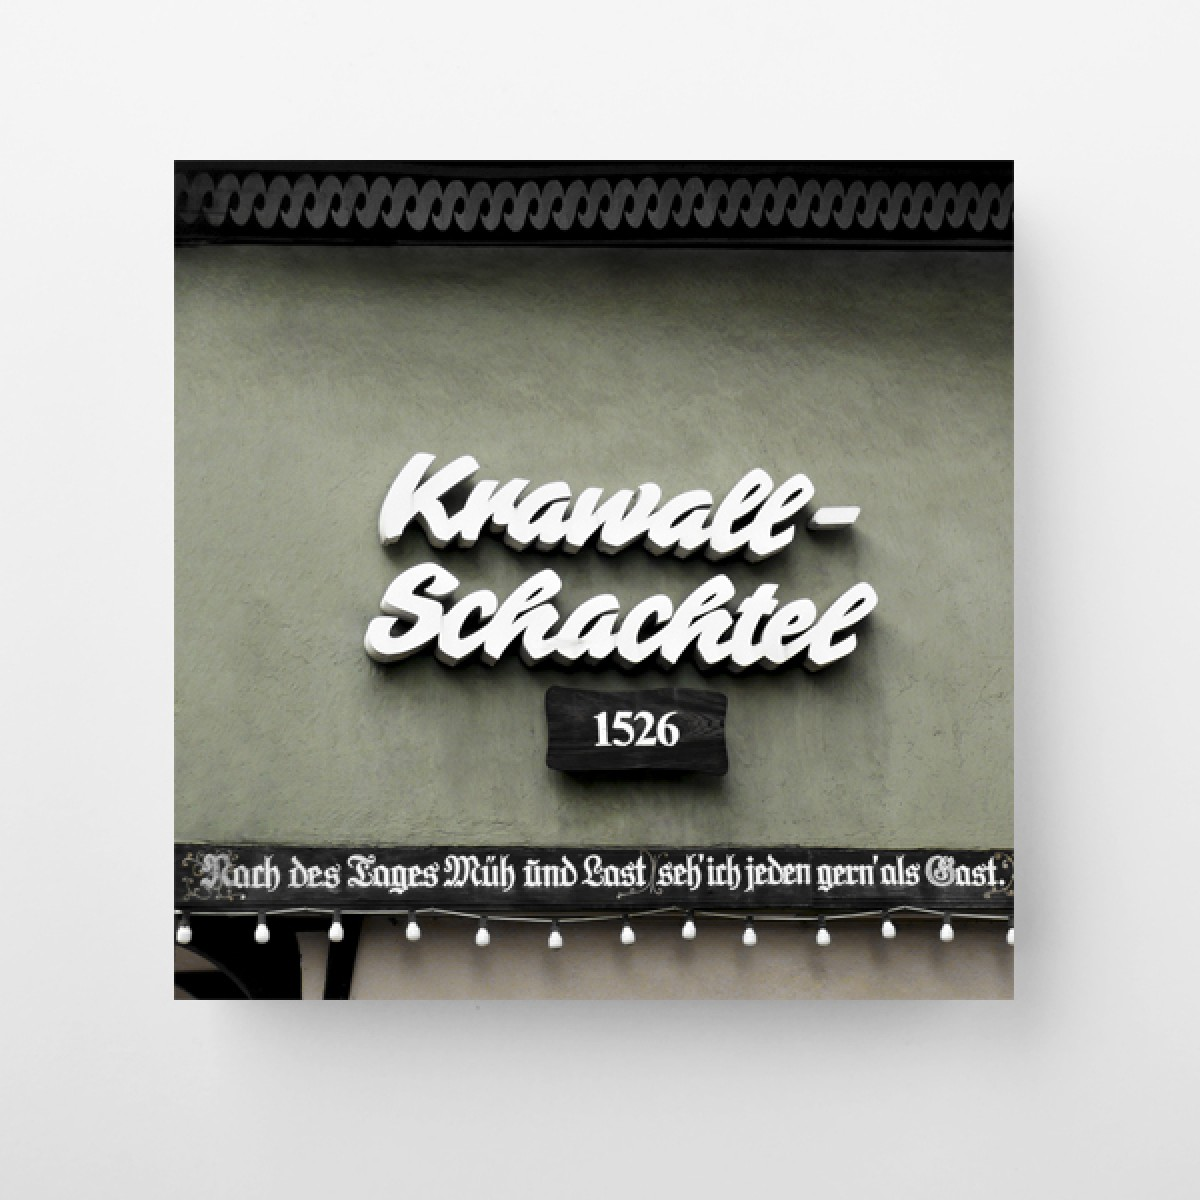 FrankfurterBubb Krawallschachtel Foto-Kachel